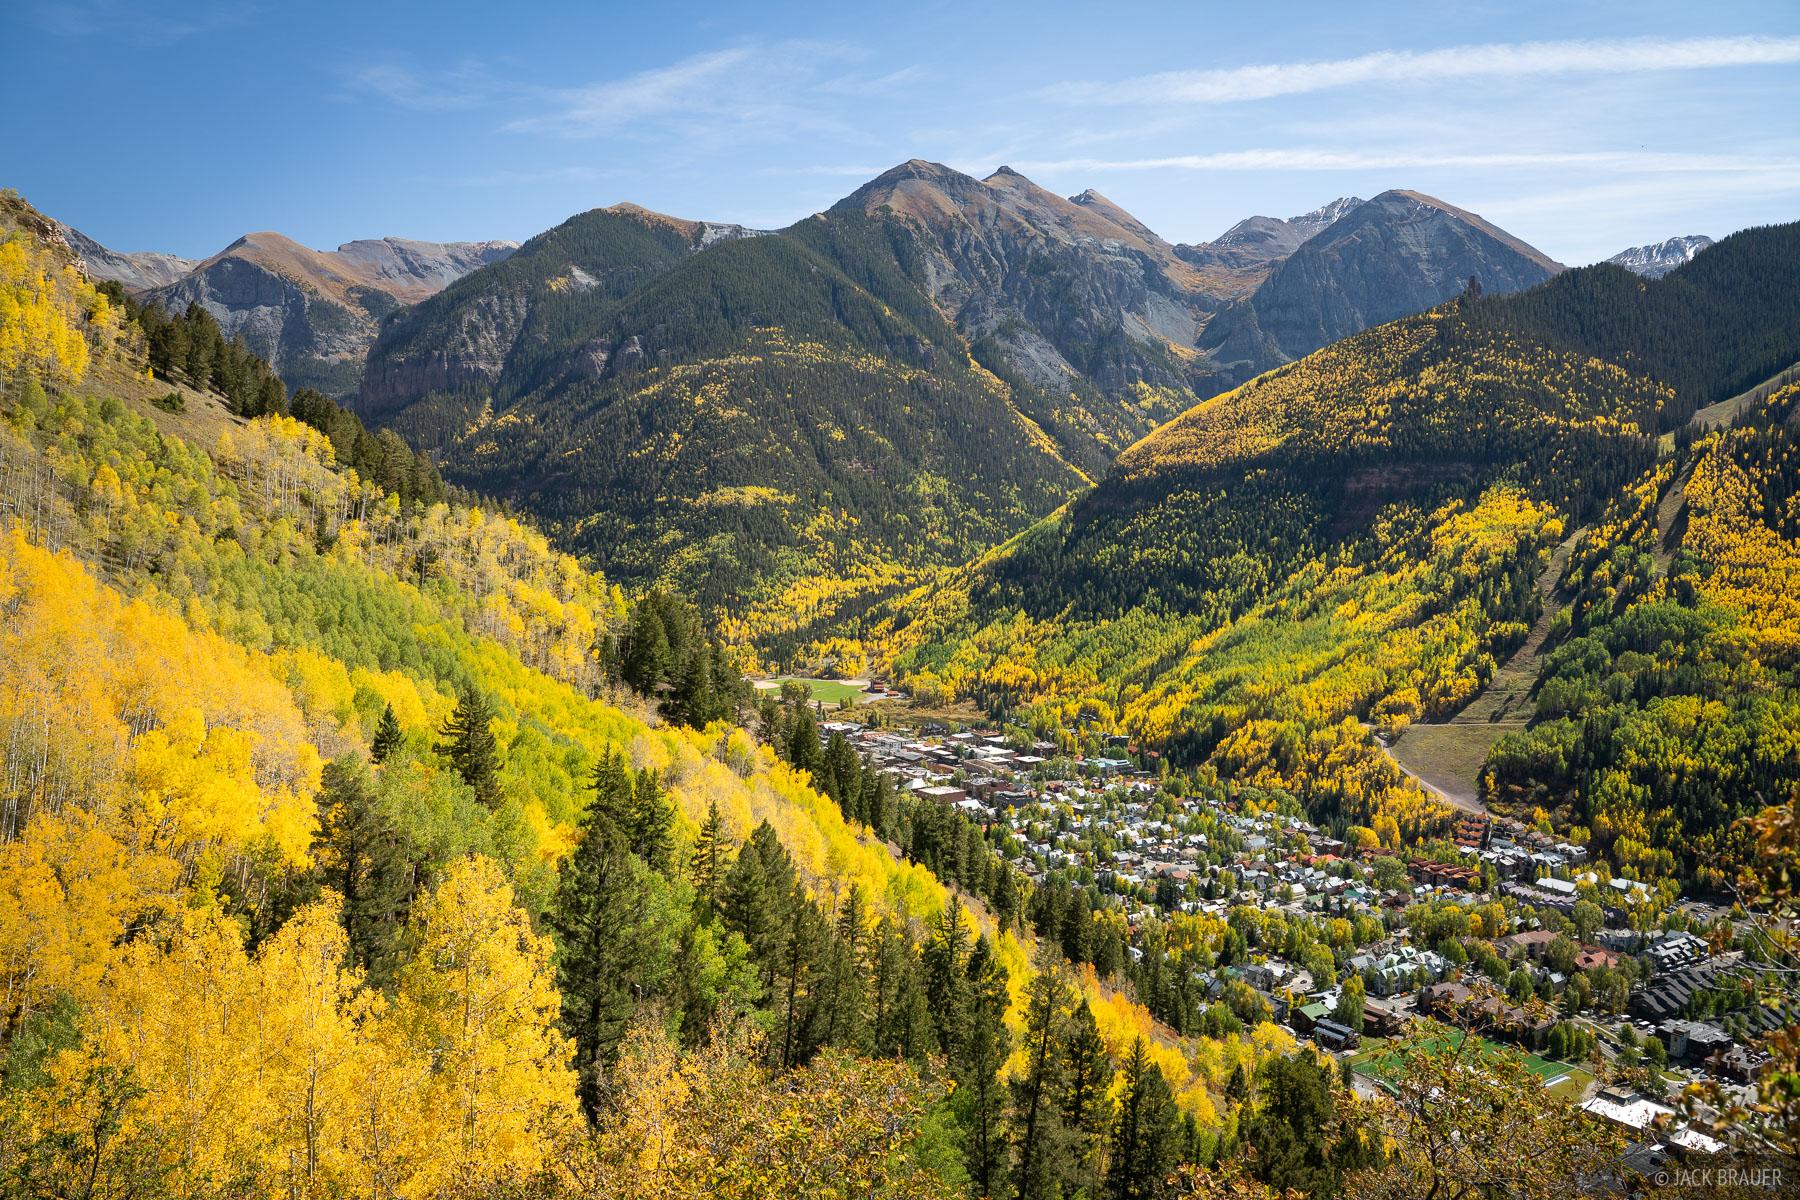 Colorado, San Juan Mountains, aspens, autumn, fall, Telluride, photo